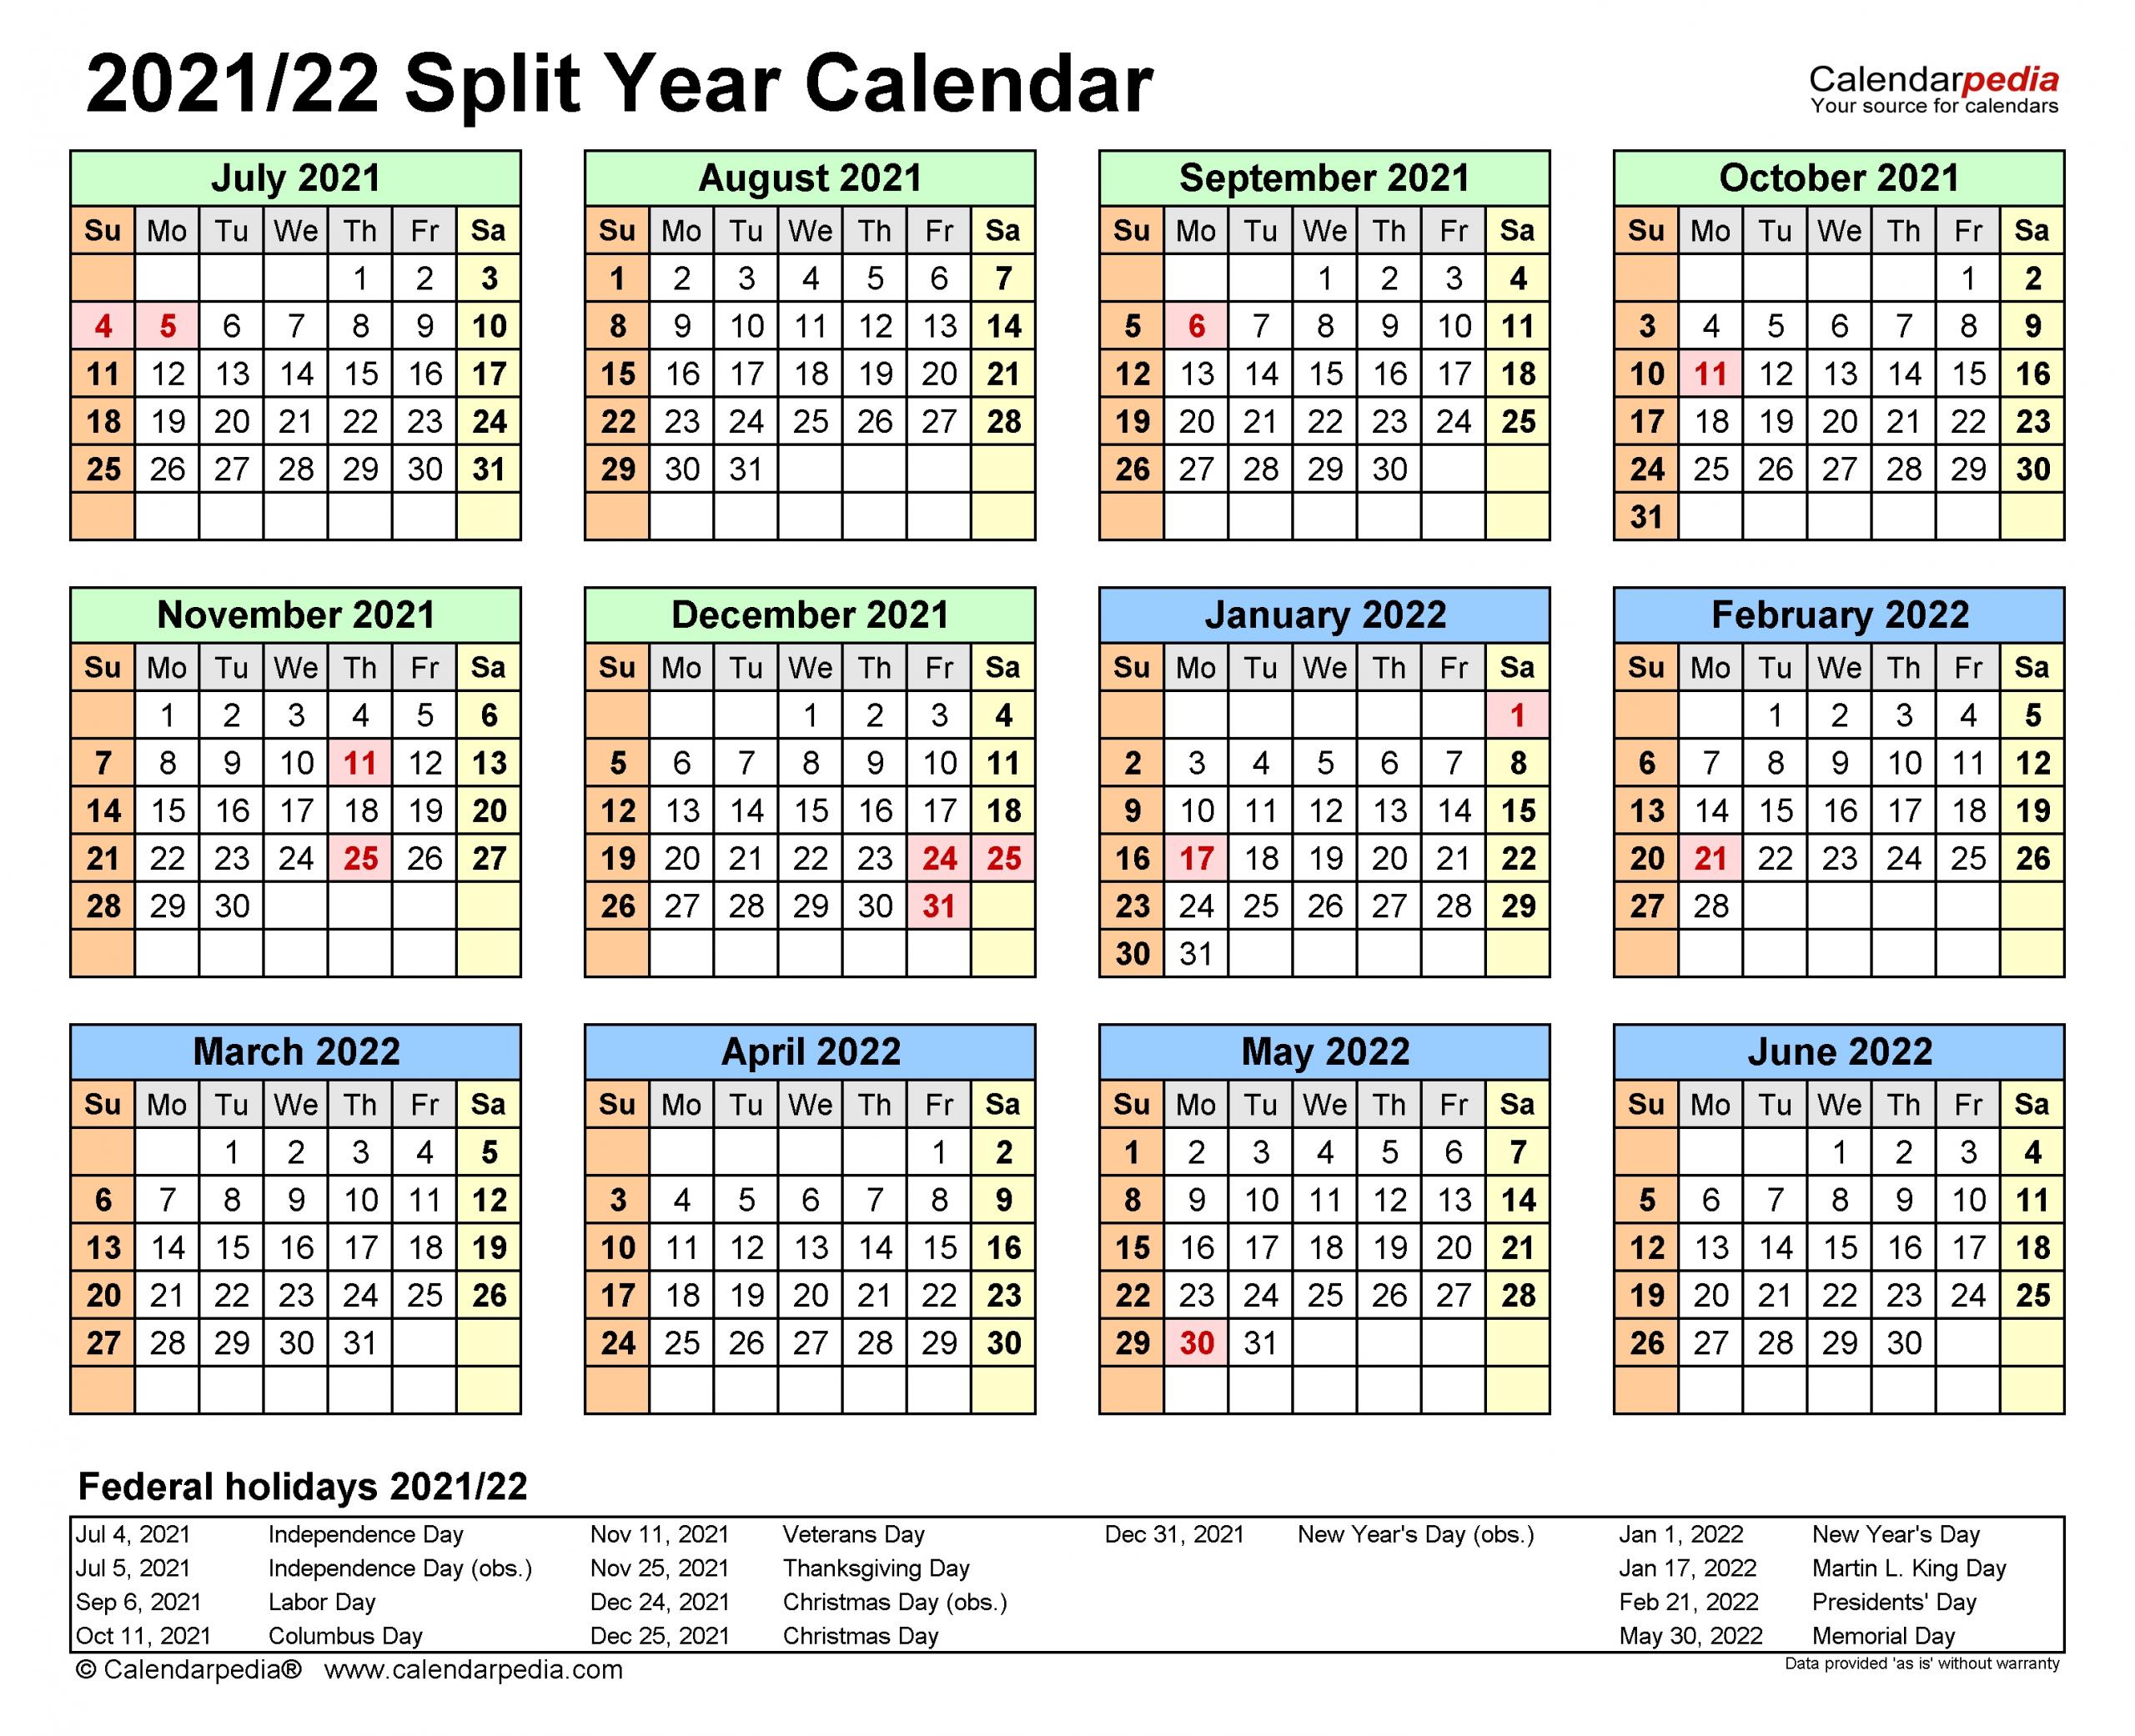 Depo Calendar 2022 Printable.Split Year Calendars 2021 2022 July To June Pdf Templates Get Your Calendar Printable